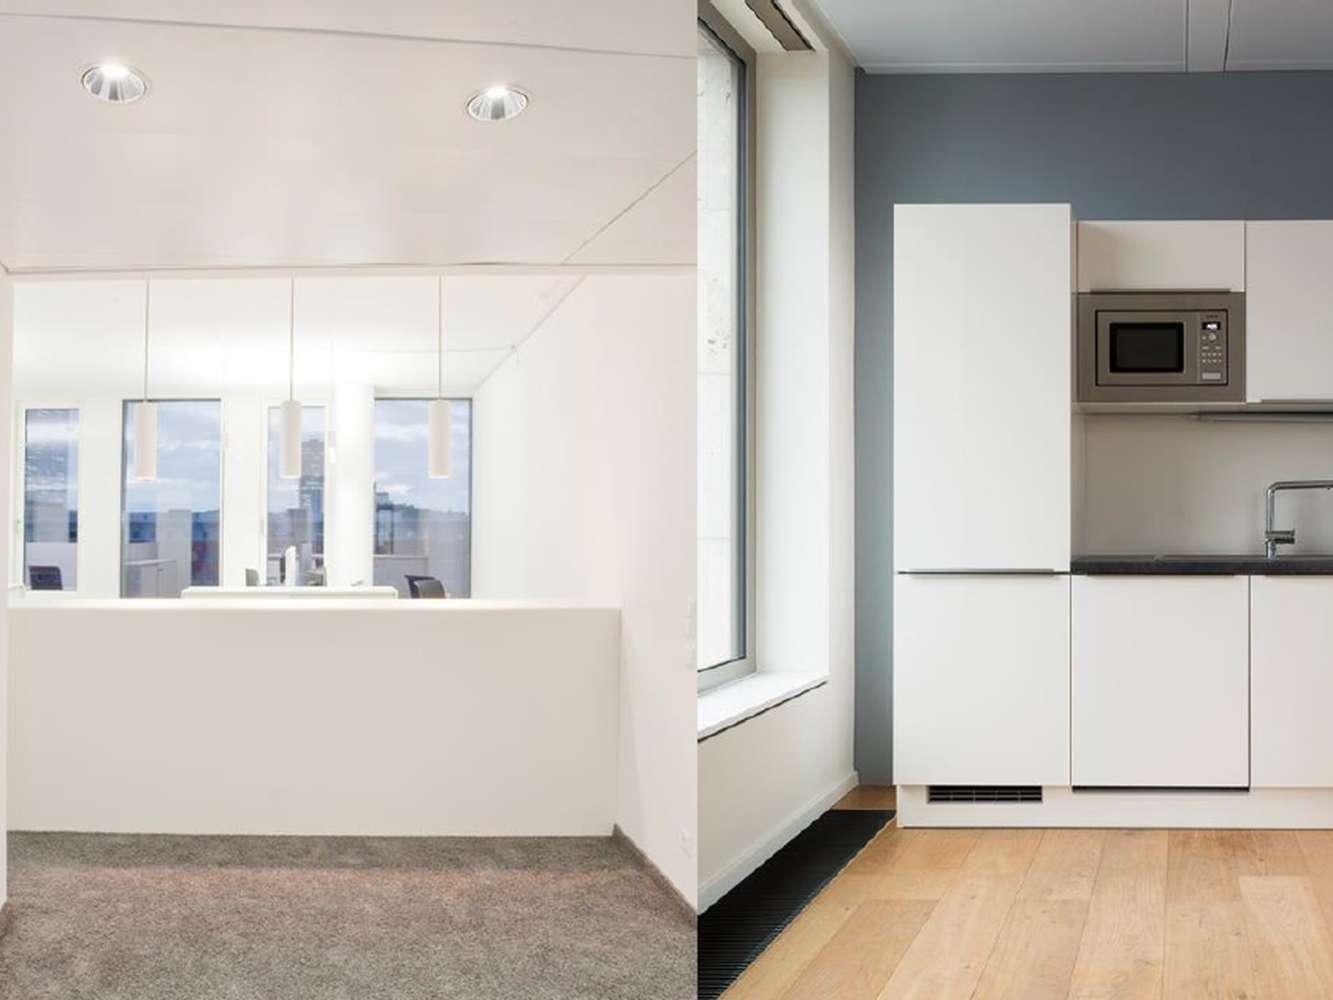 Büros Hamburg, 20097 - Büro - Hamburg, Hammerbrook - H1288 - 9748087